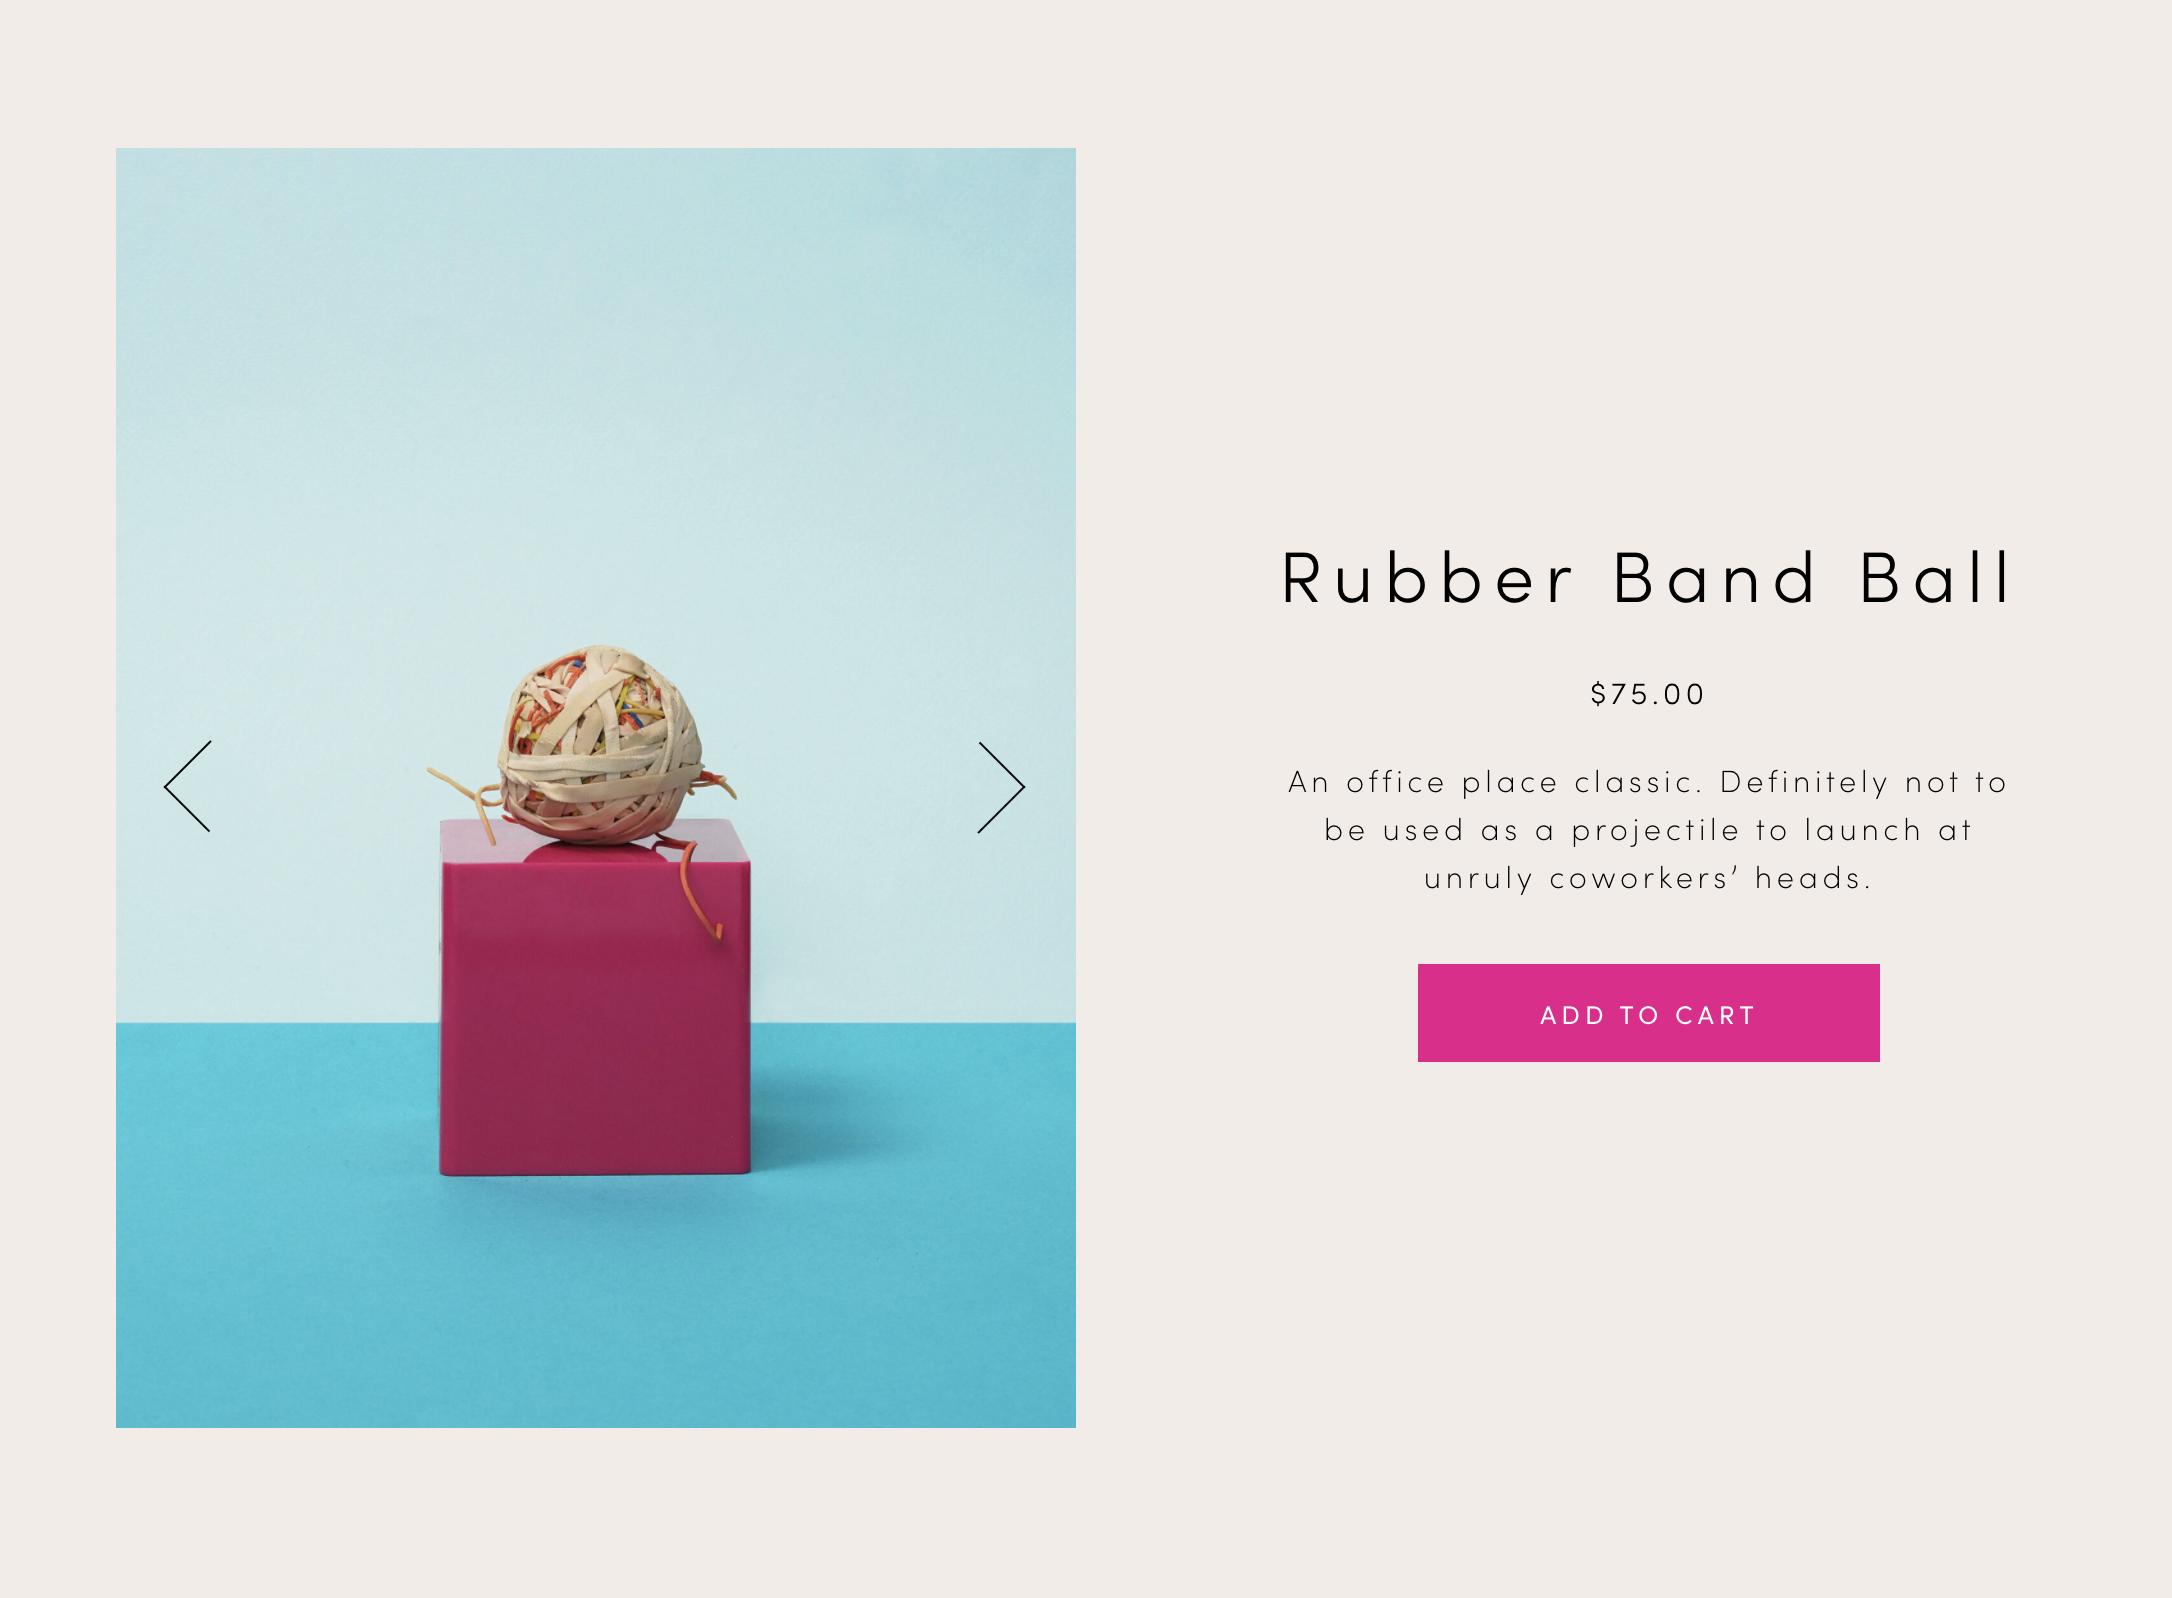 TS Rubber Band Ball